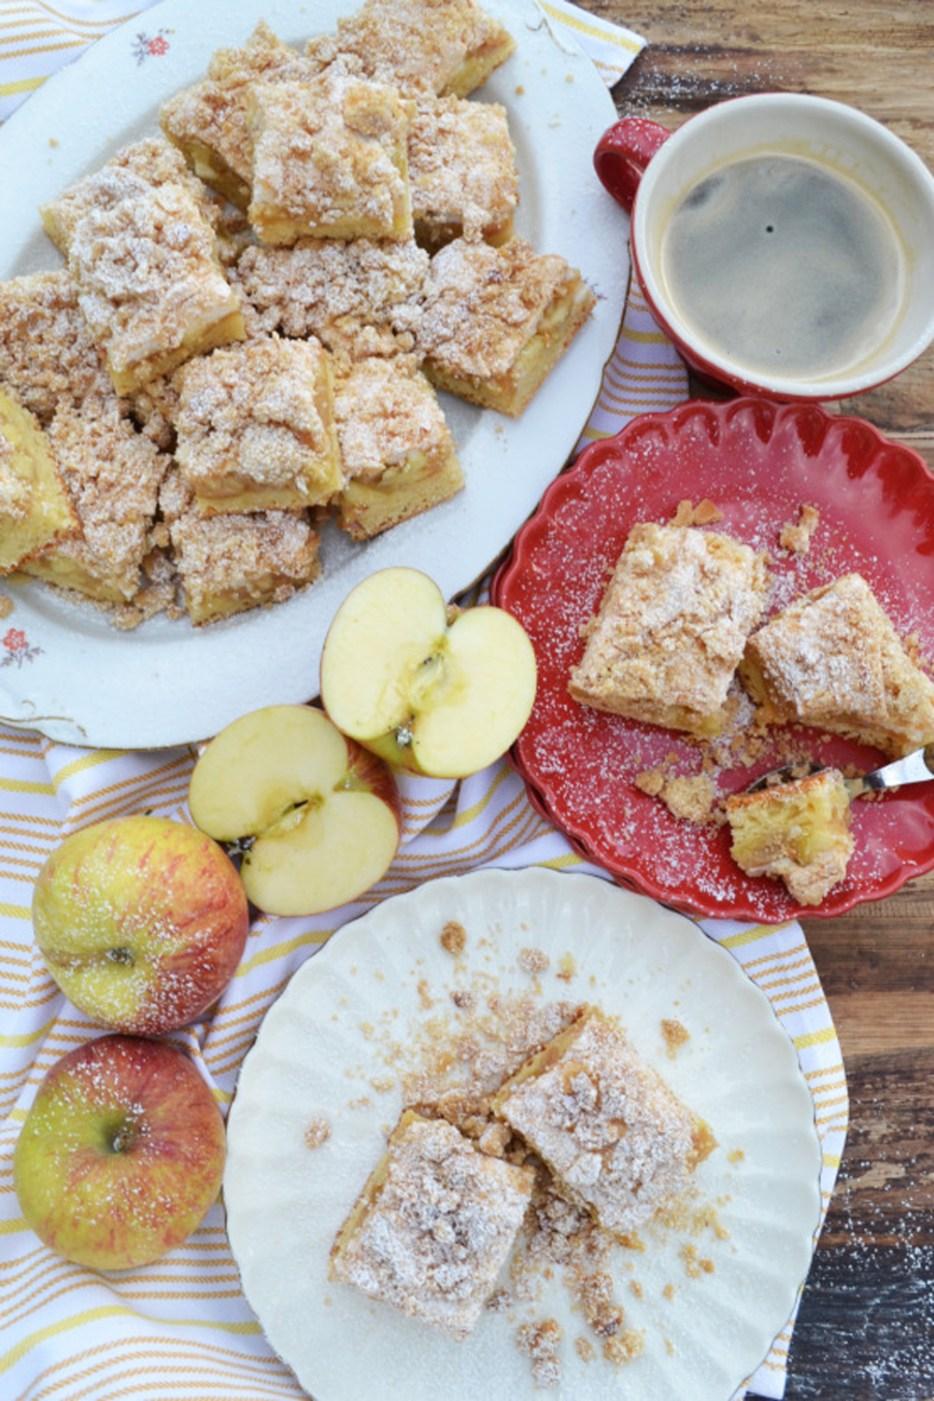 Verboten Gut Apfel Streusel Kuchen Mit Baiser Meinleckeresleben Com